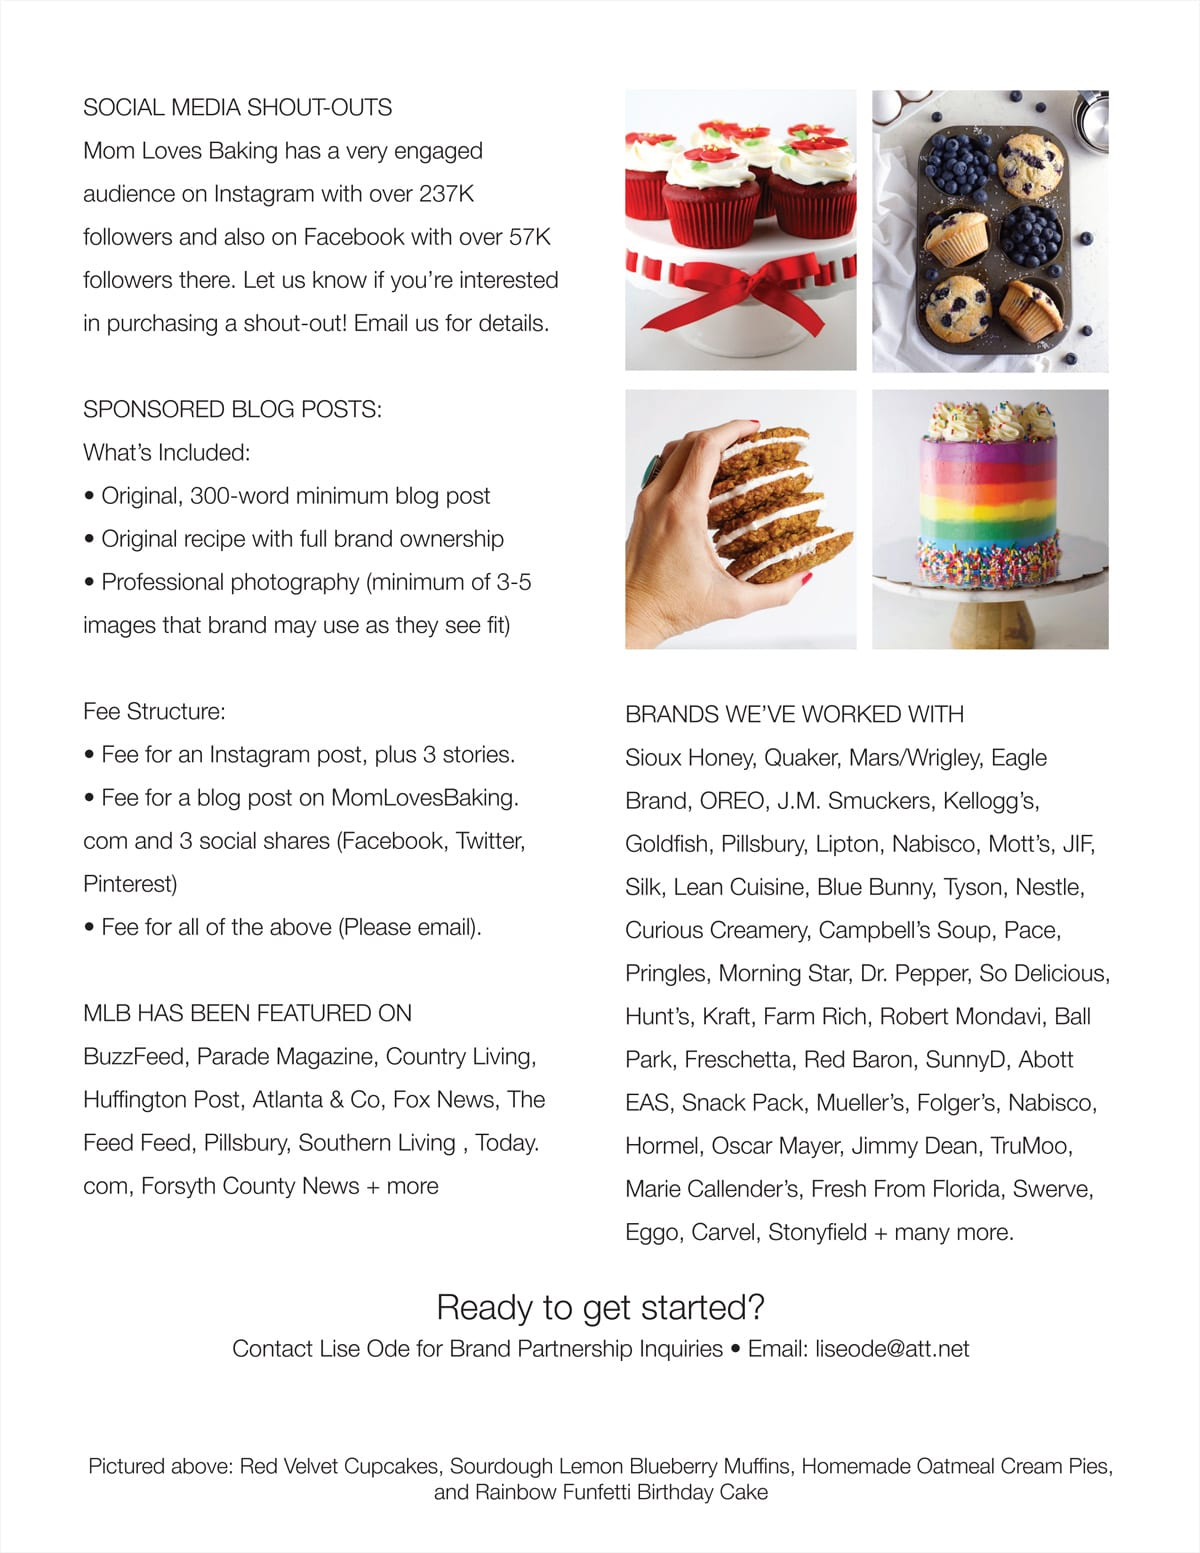 Media Kit for Mom Loves Baking page 2